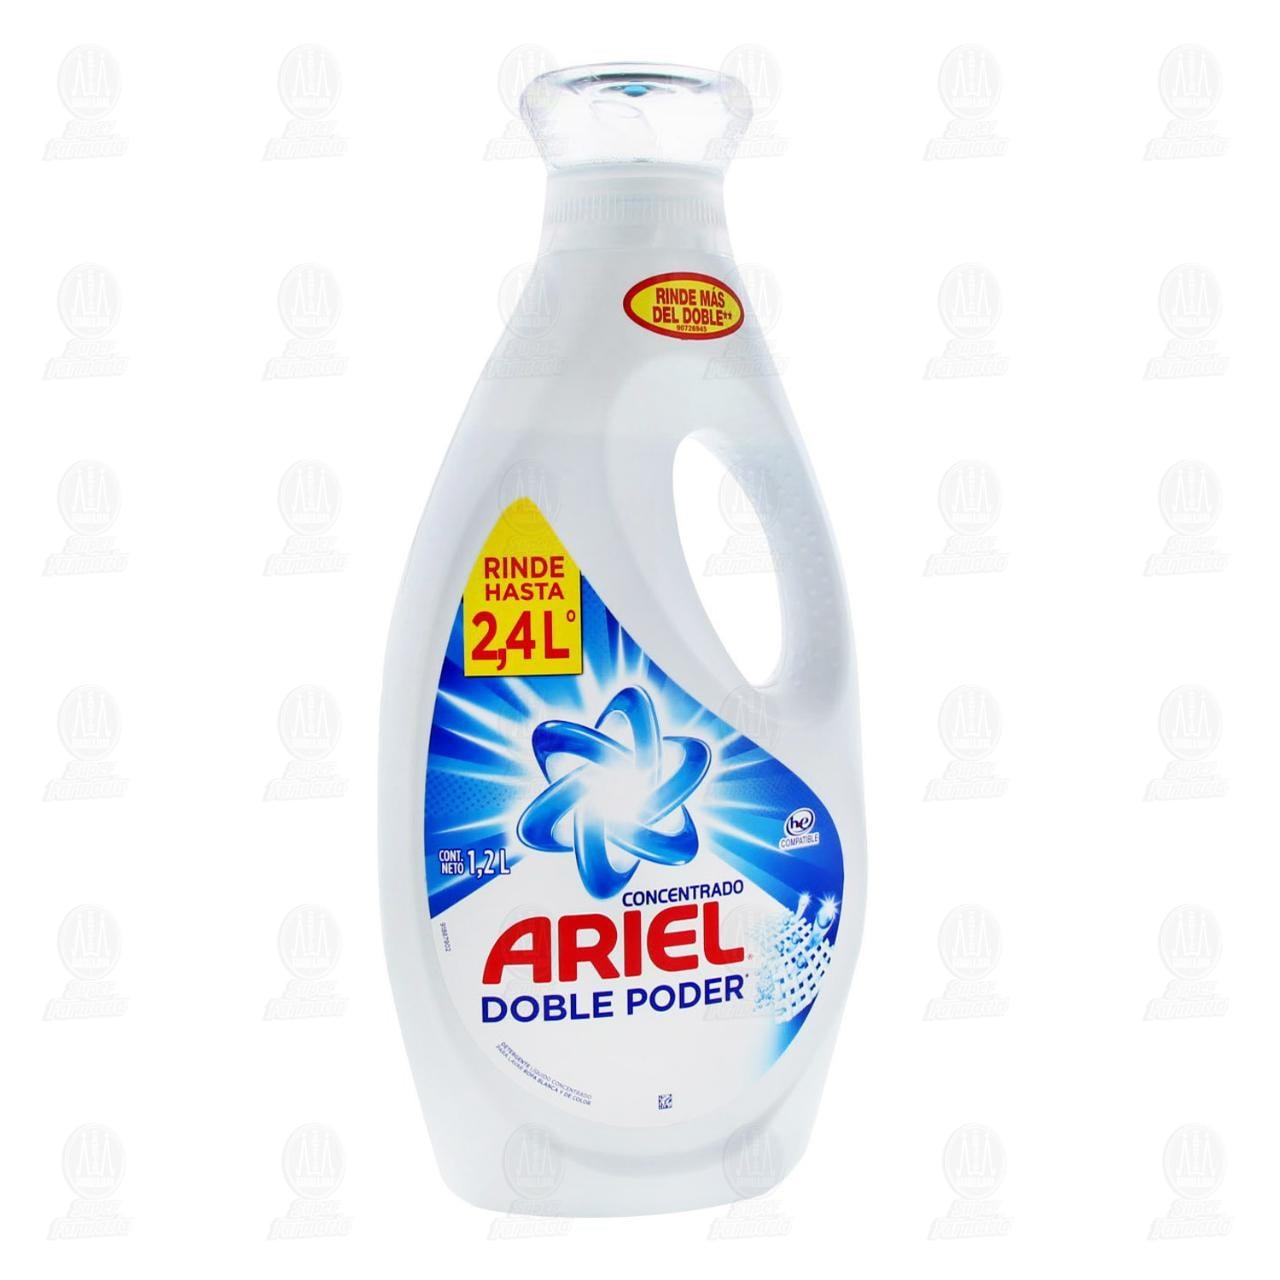 Detergente Ariel Líquido Concentrado Doble Poder Botella 1.2 l.